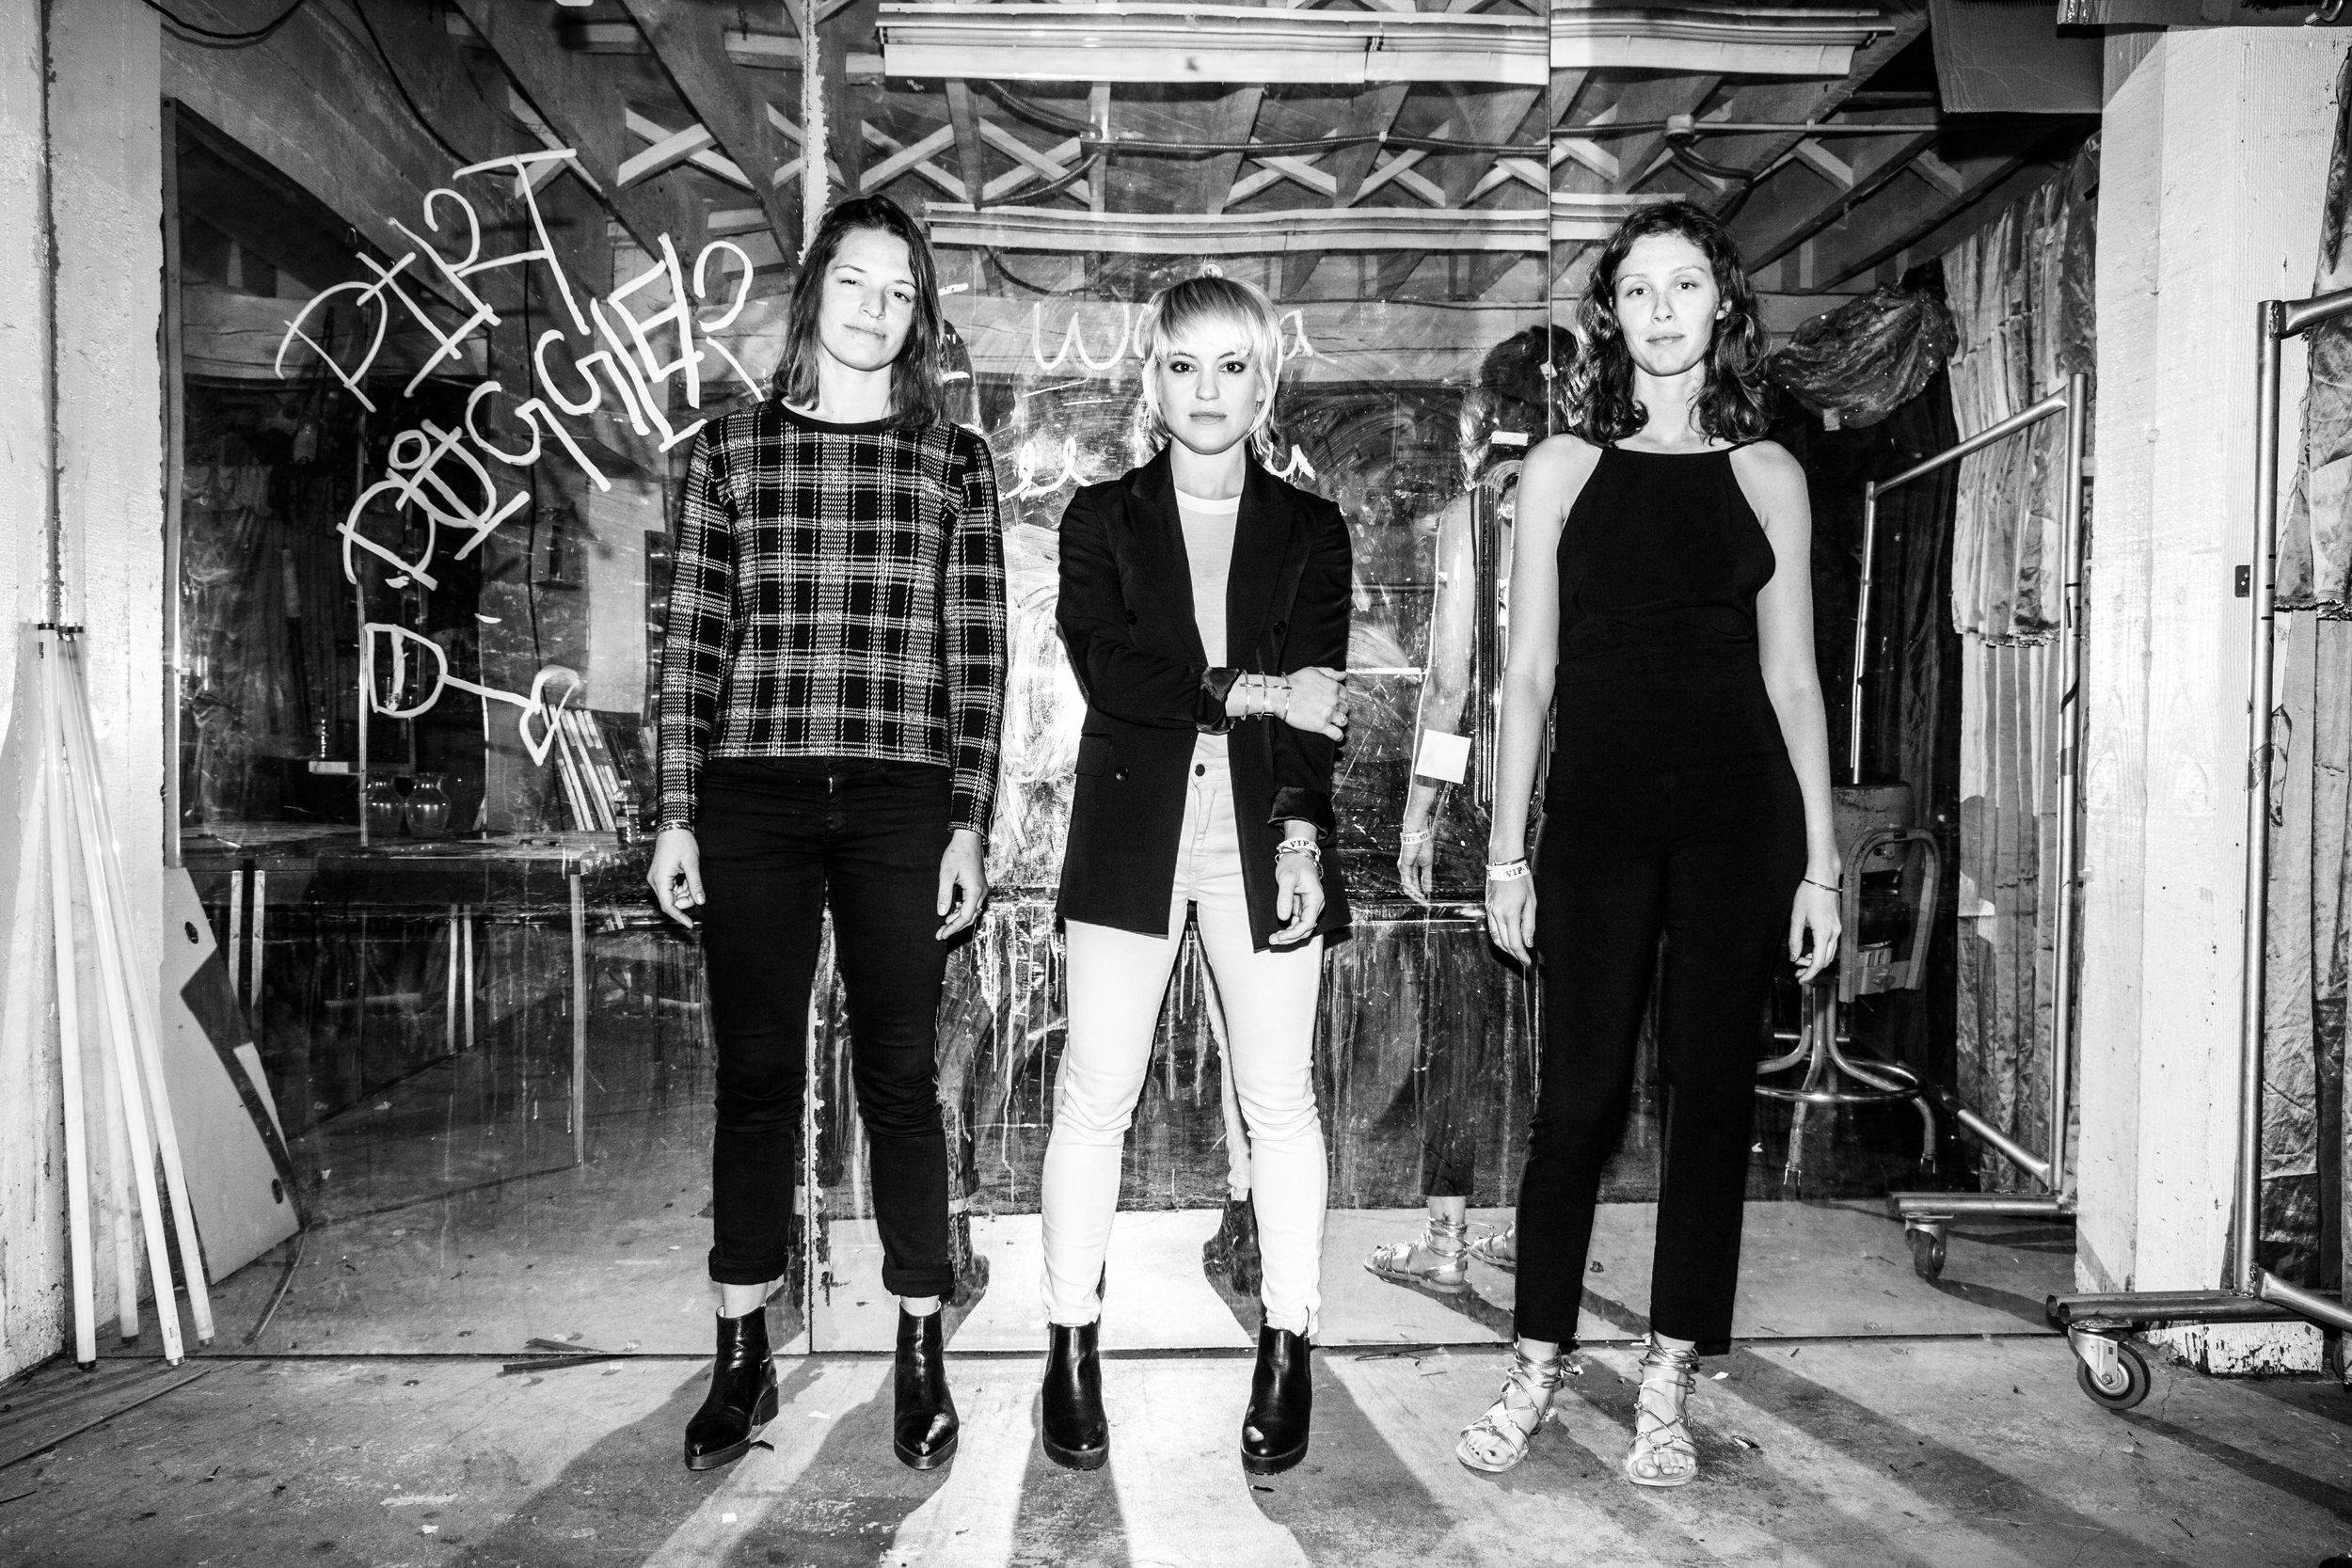 Adrien Young, Anna Bulbrook, and Jasmine Lywen-Dill. Photo by Jen Rosenstein.